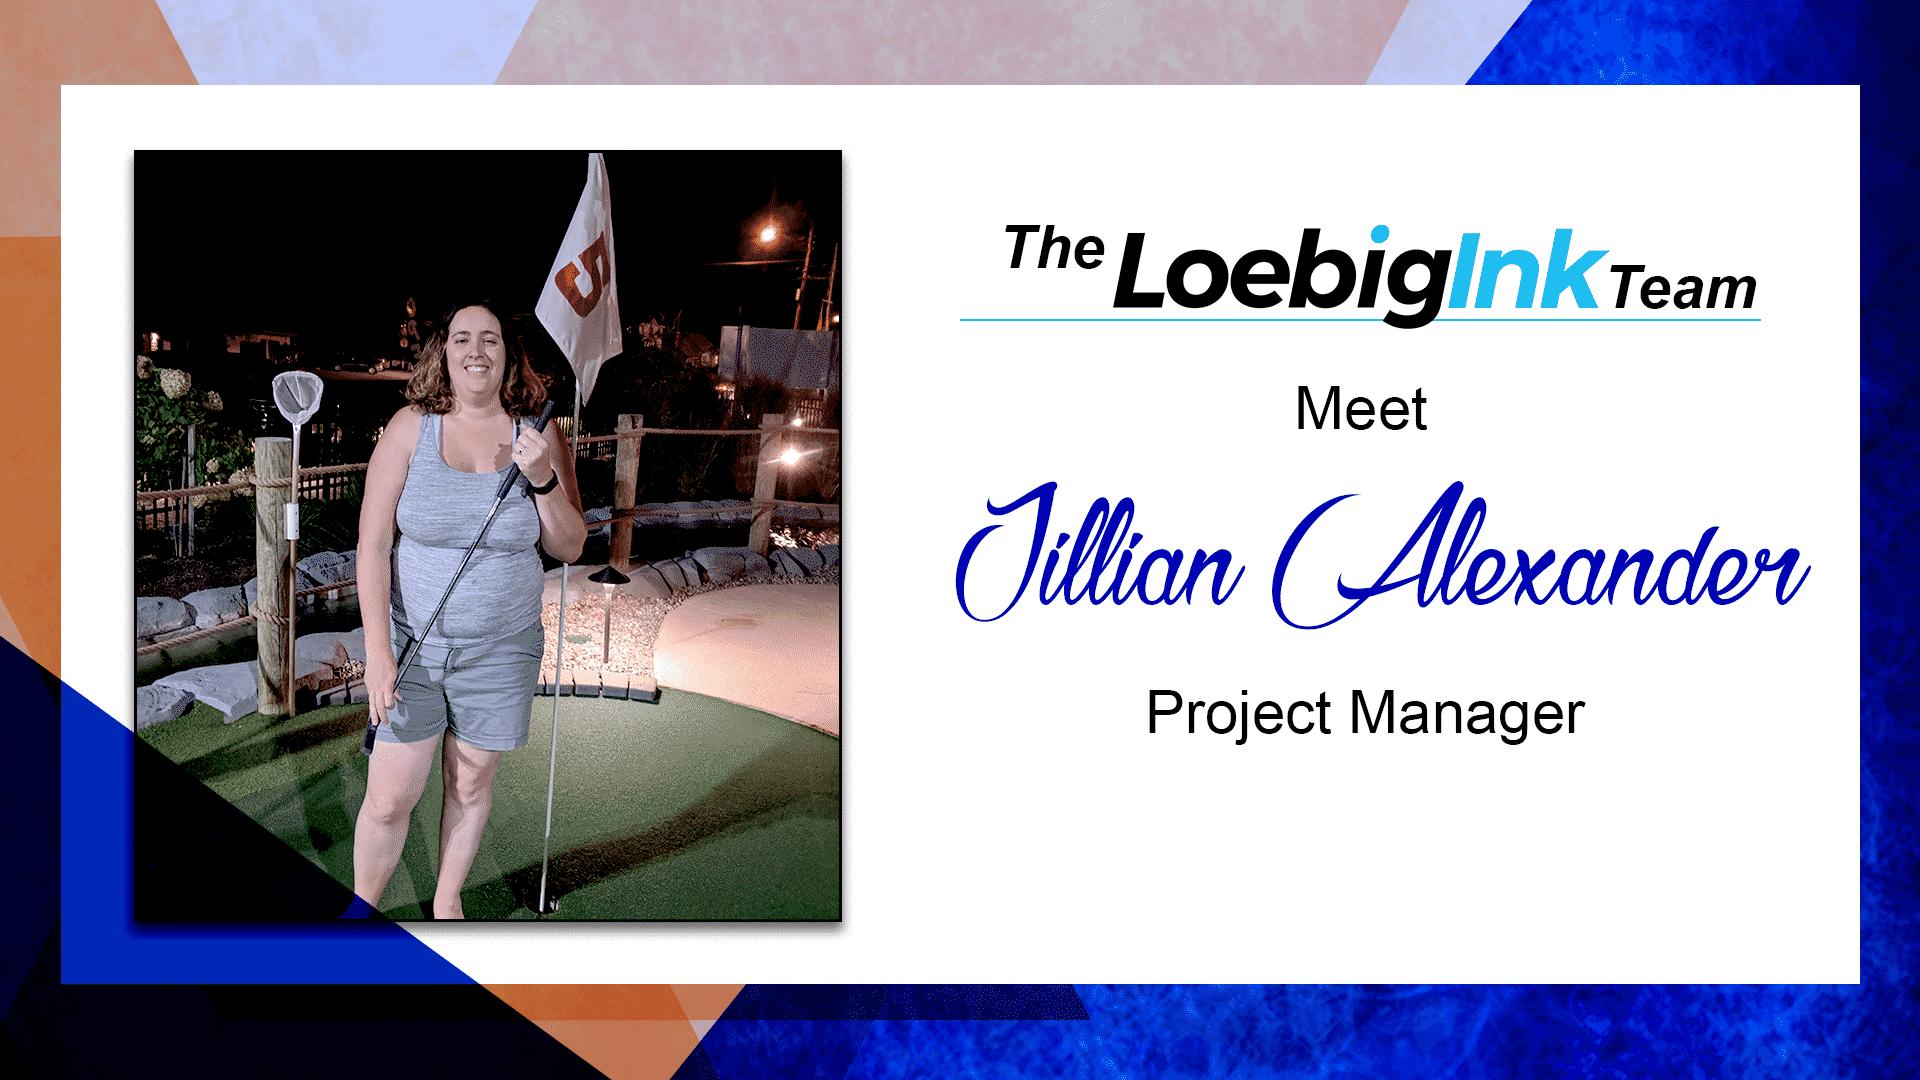 Jillian Alexander - Project Manager at Loebig Ink